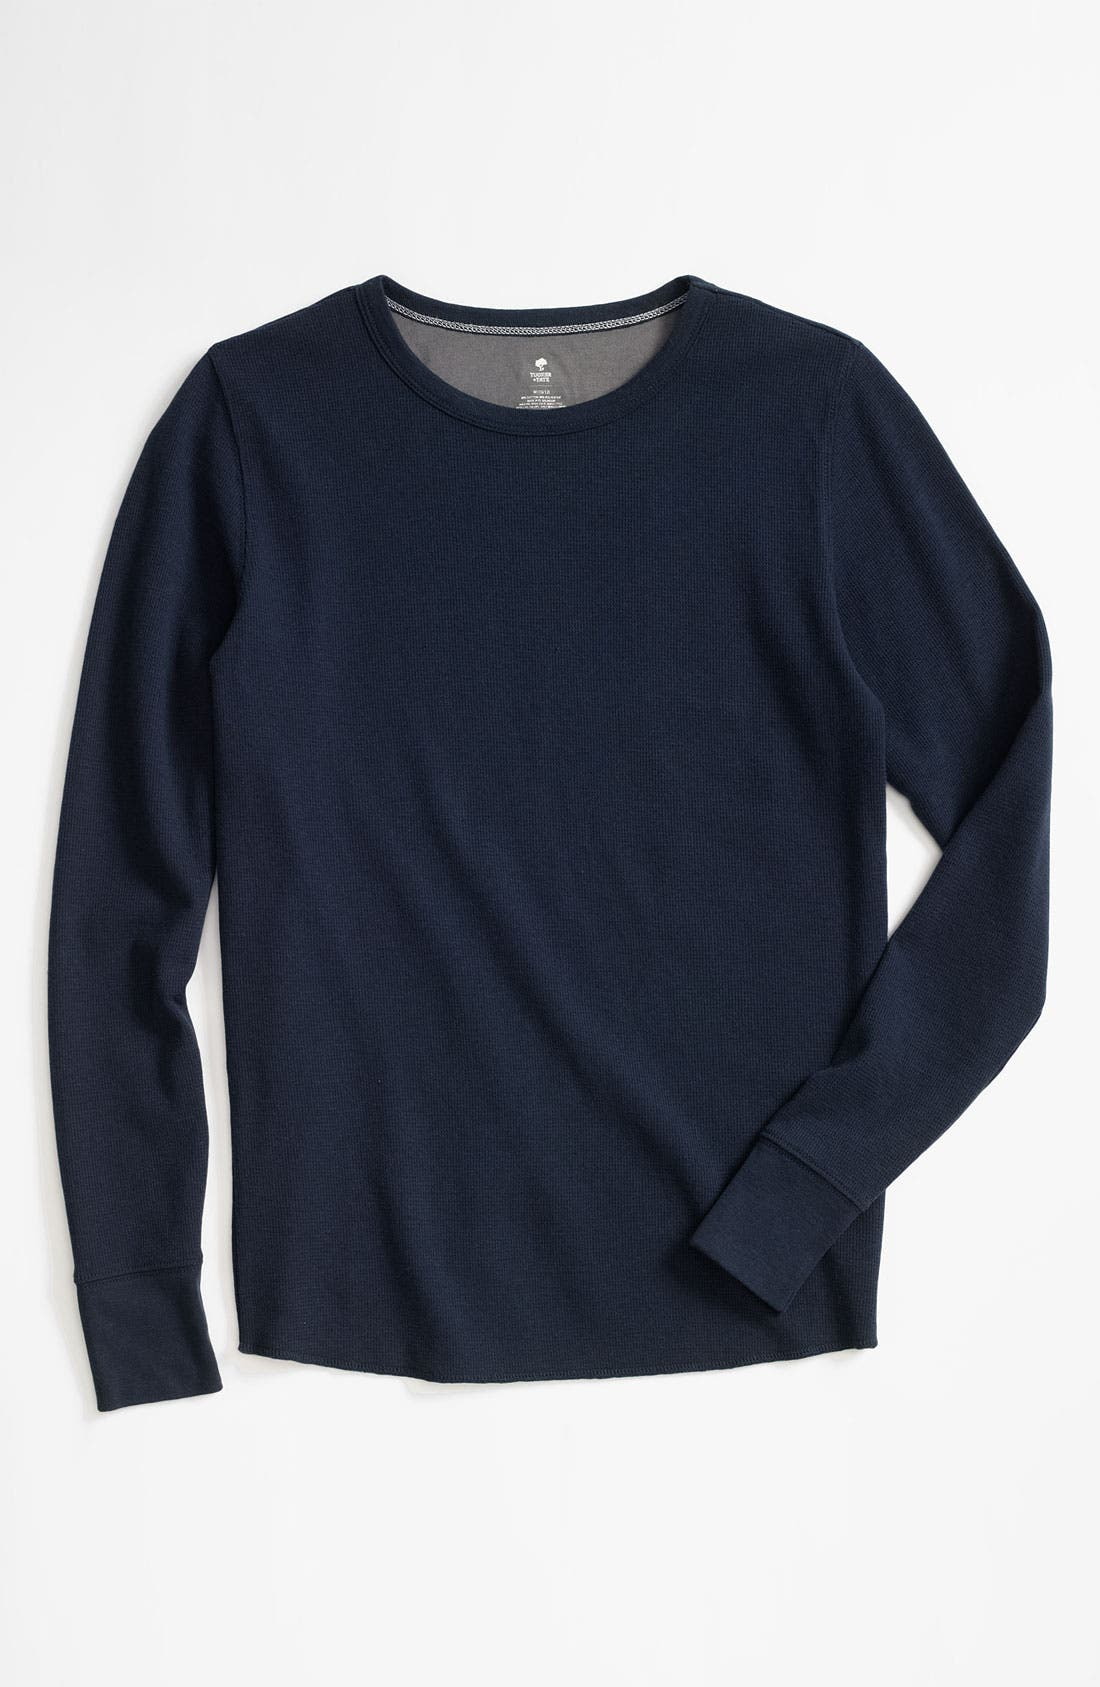 Main Image - Tucker + Tate 'Wheeler' Thermal T-Shirt (Little Boys)